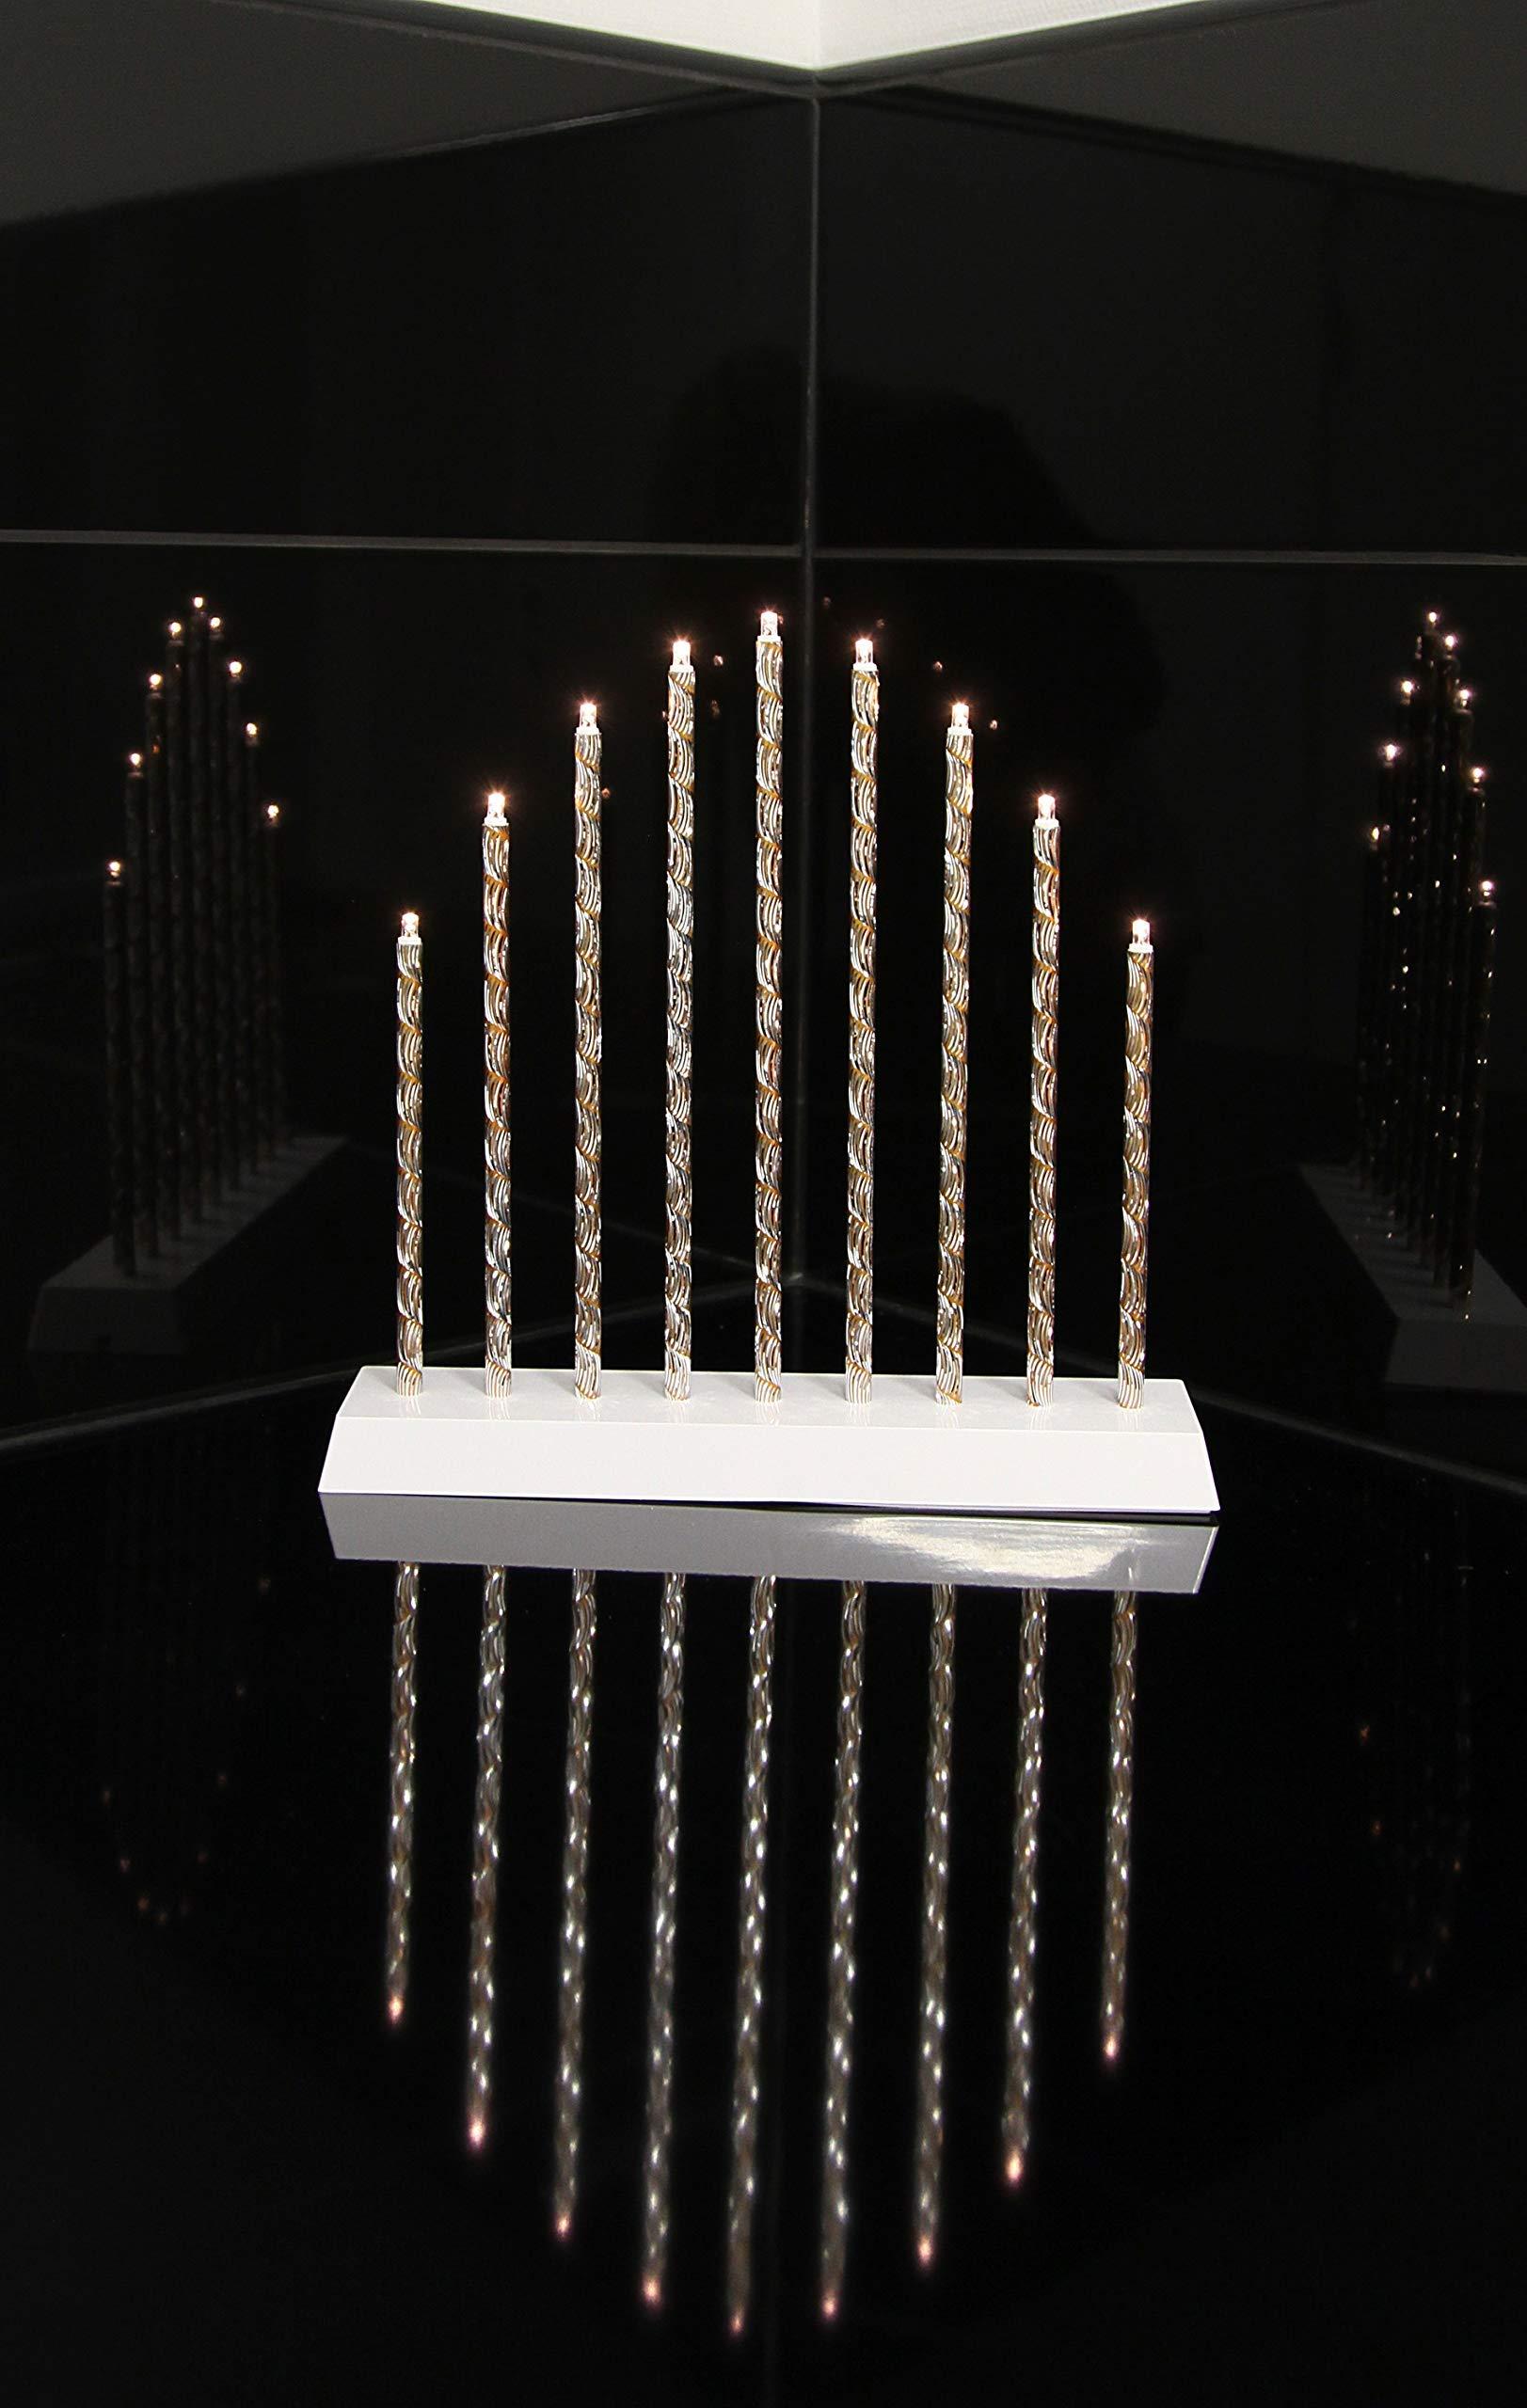 Star-LED-FensterleuchterTrix-Battery-Material-Kunststoff-9-flammig-Timer-Vierfarb-Karton-28-x-26-cm-goldsilber-192-81